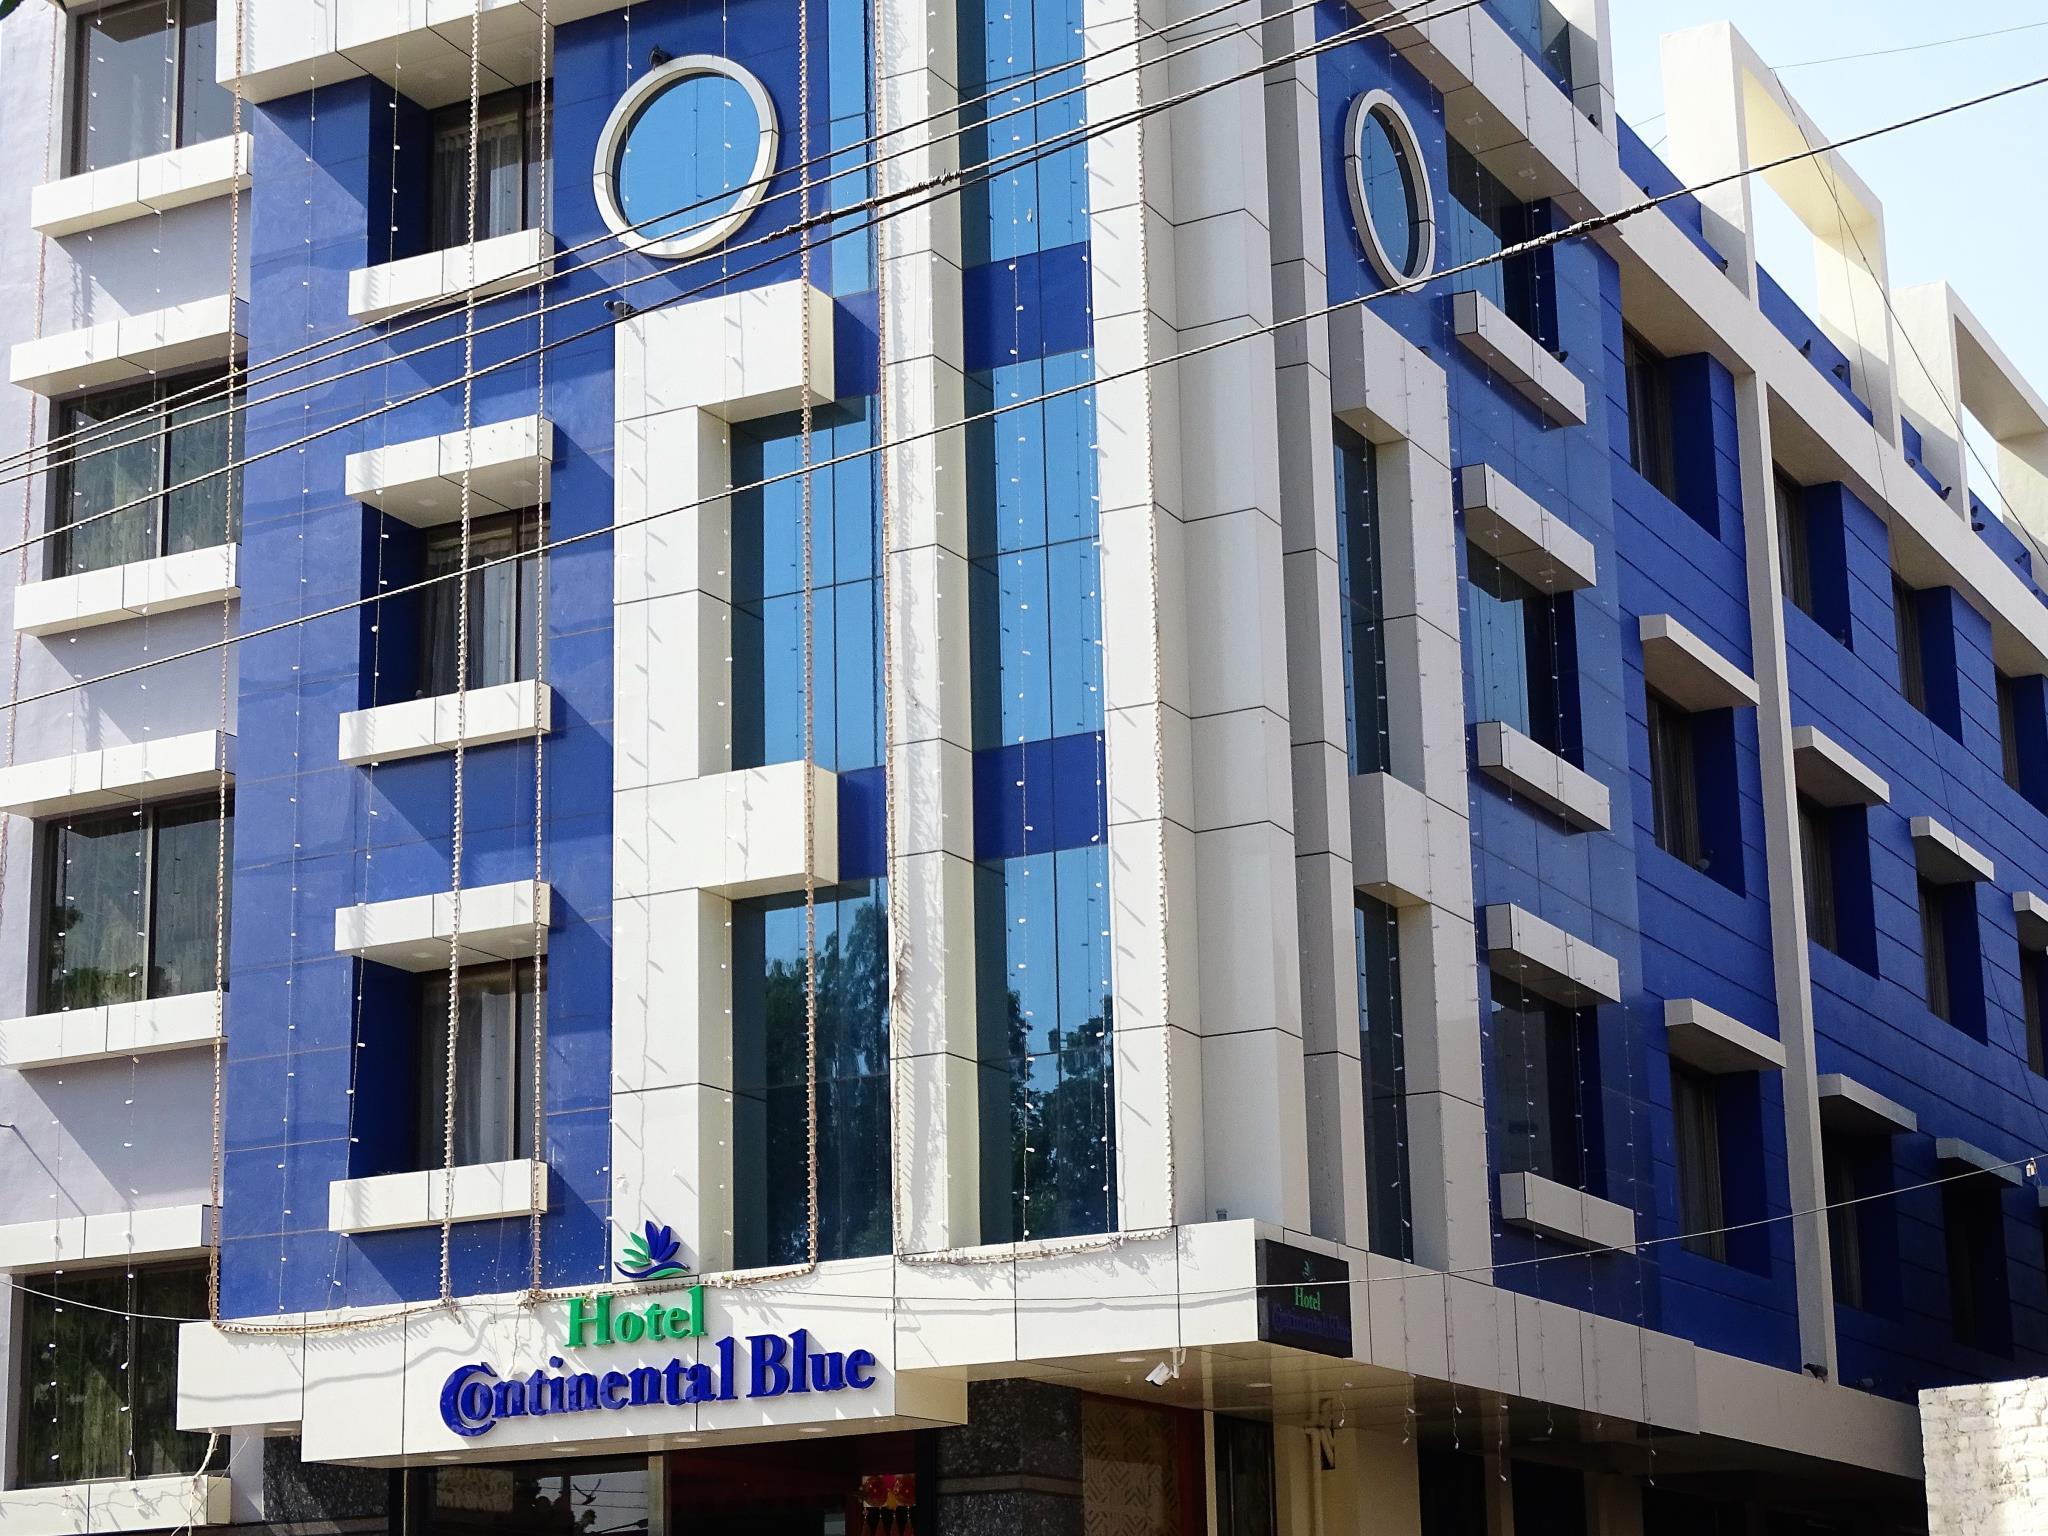 Hotel Continental Blue